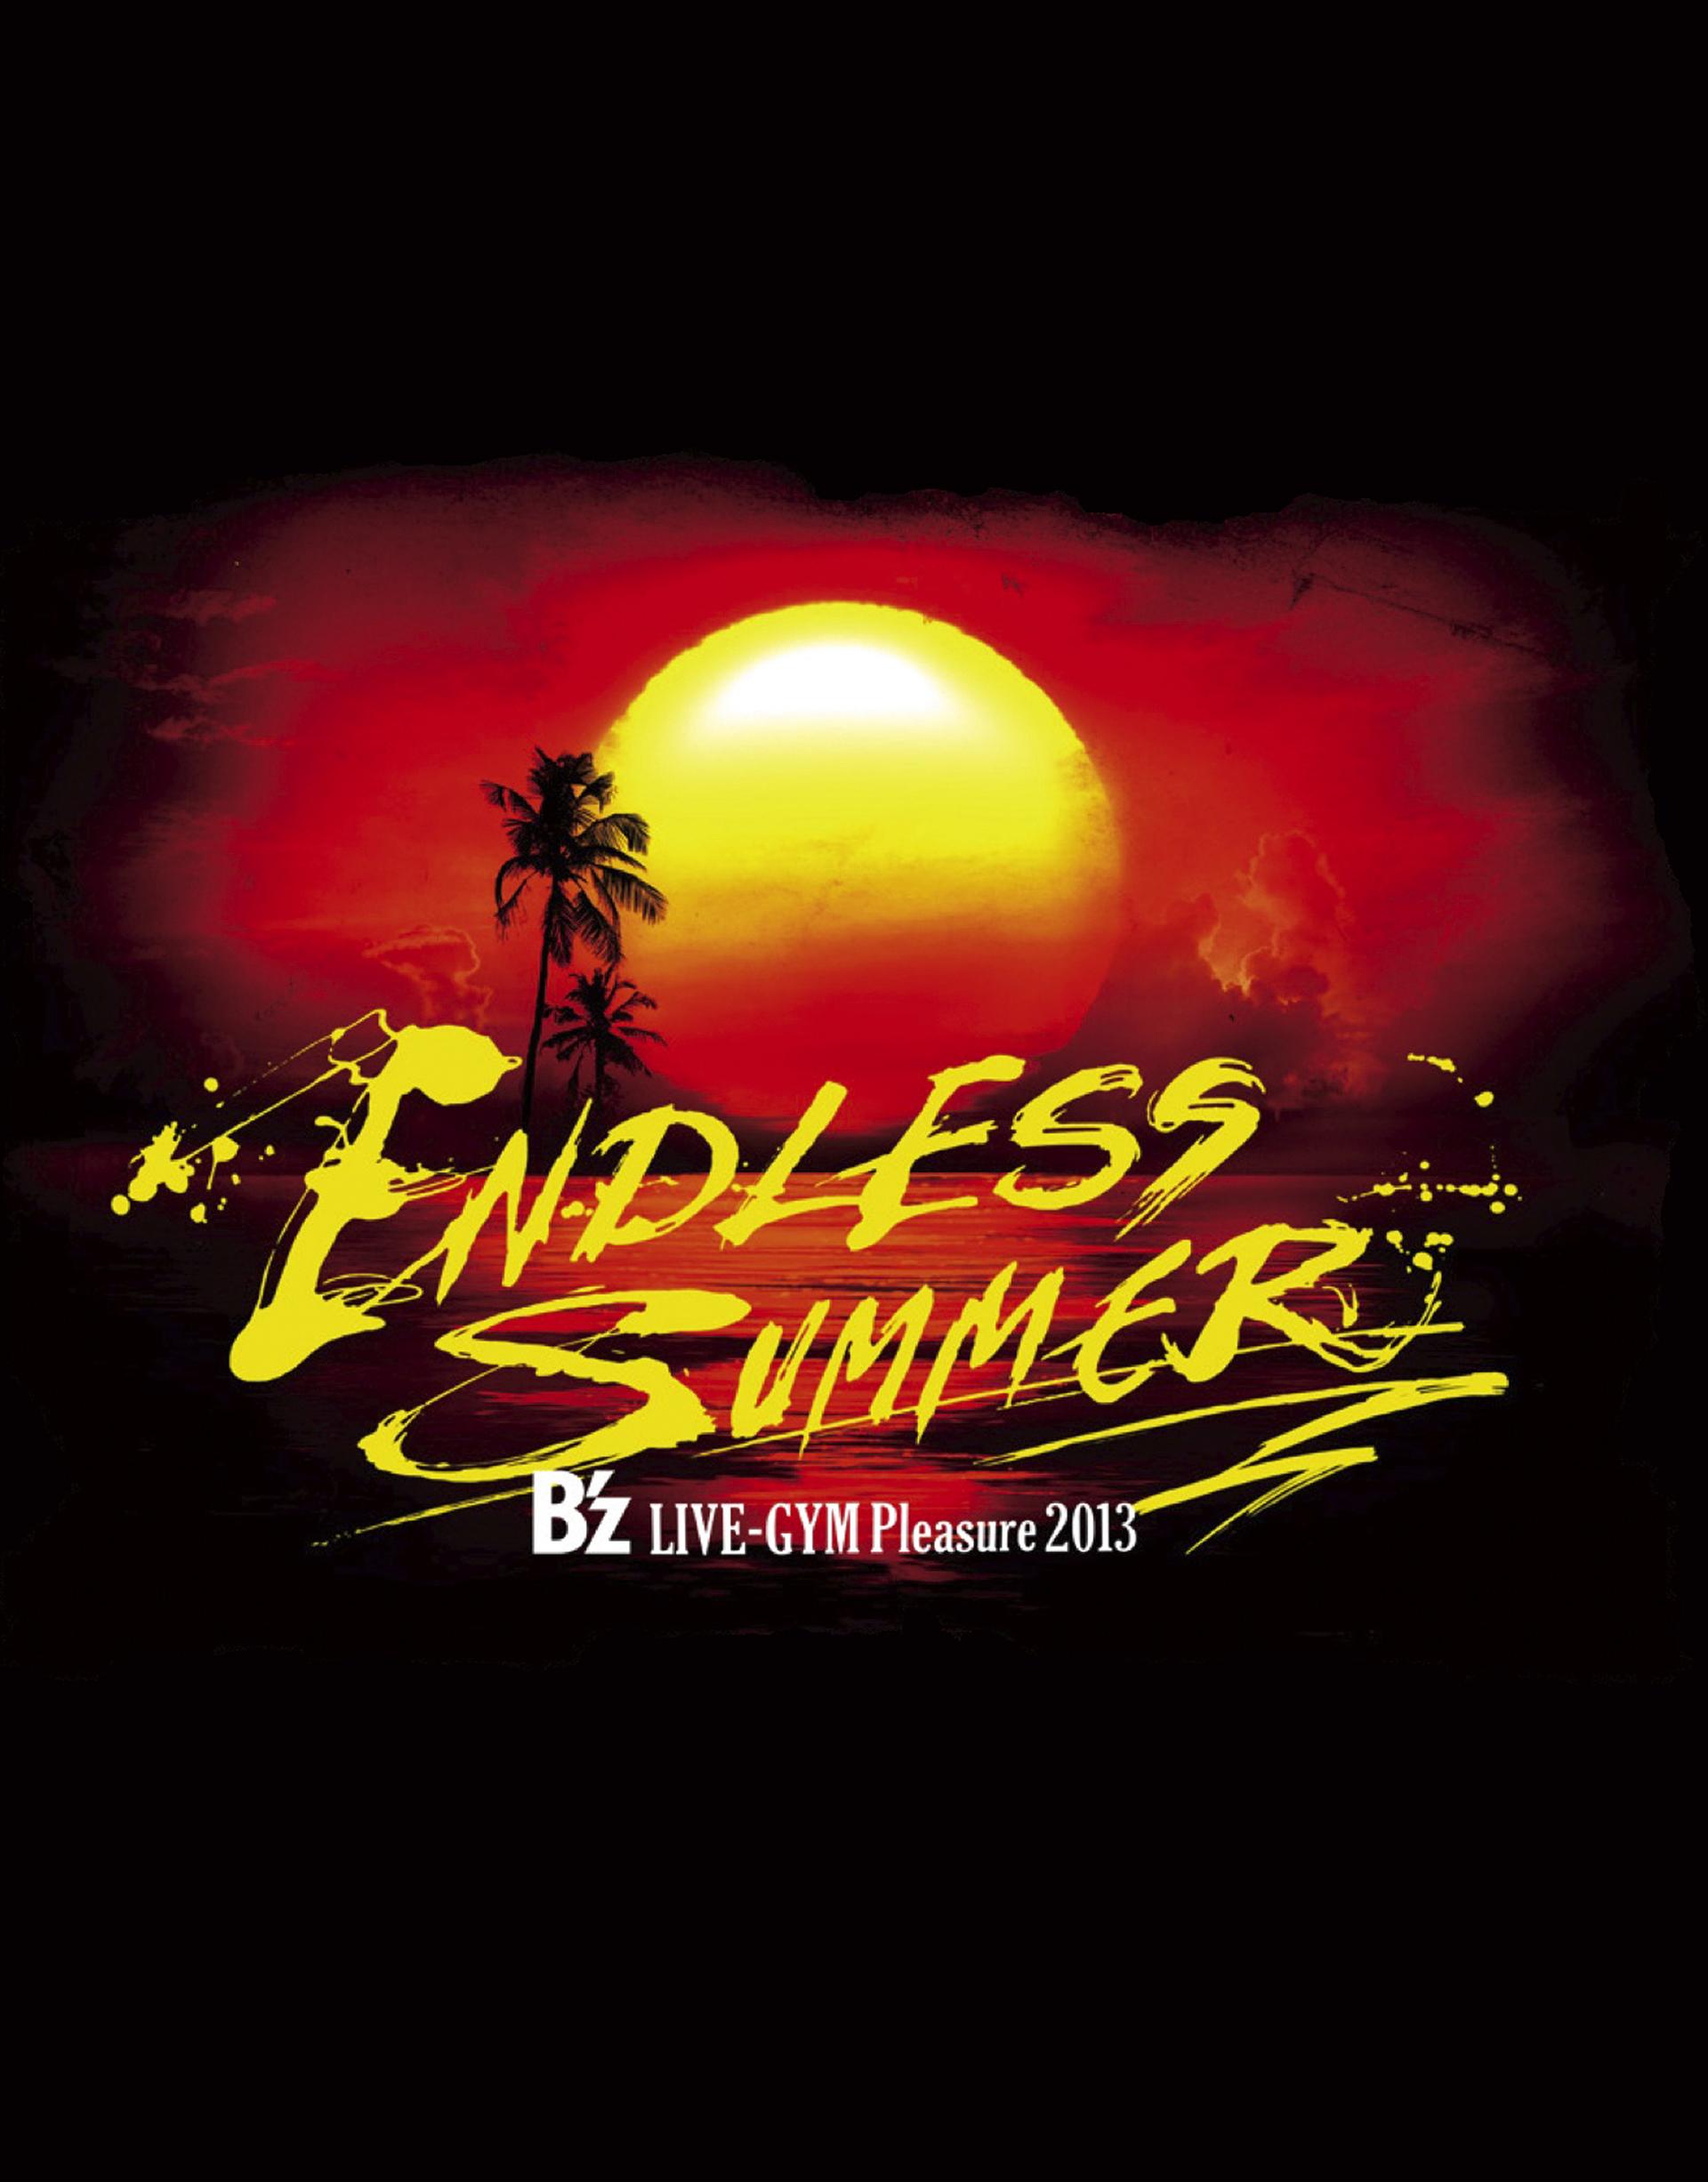 B'z LIVE-GYM Pleasure 2013 ENDLESS SUMMER